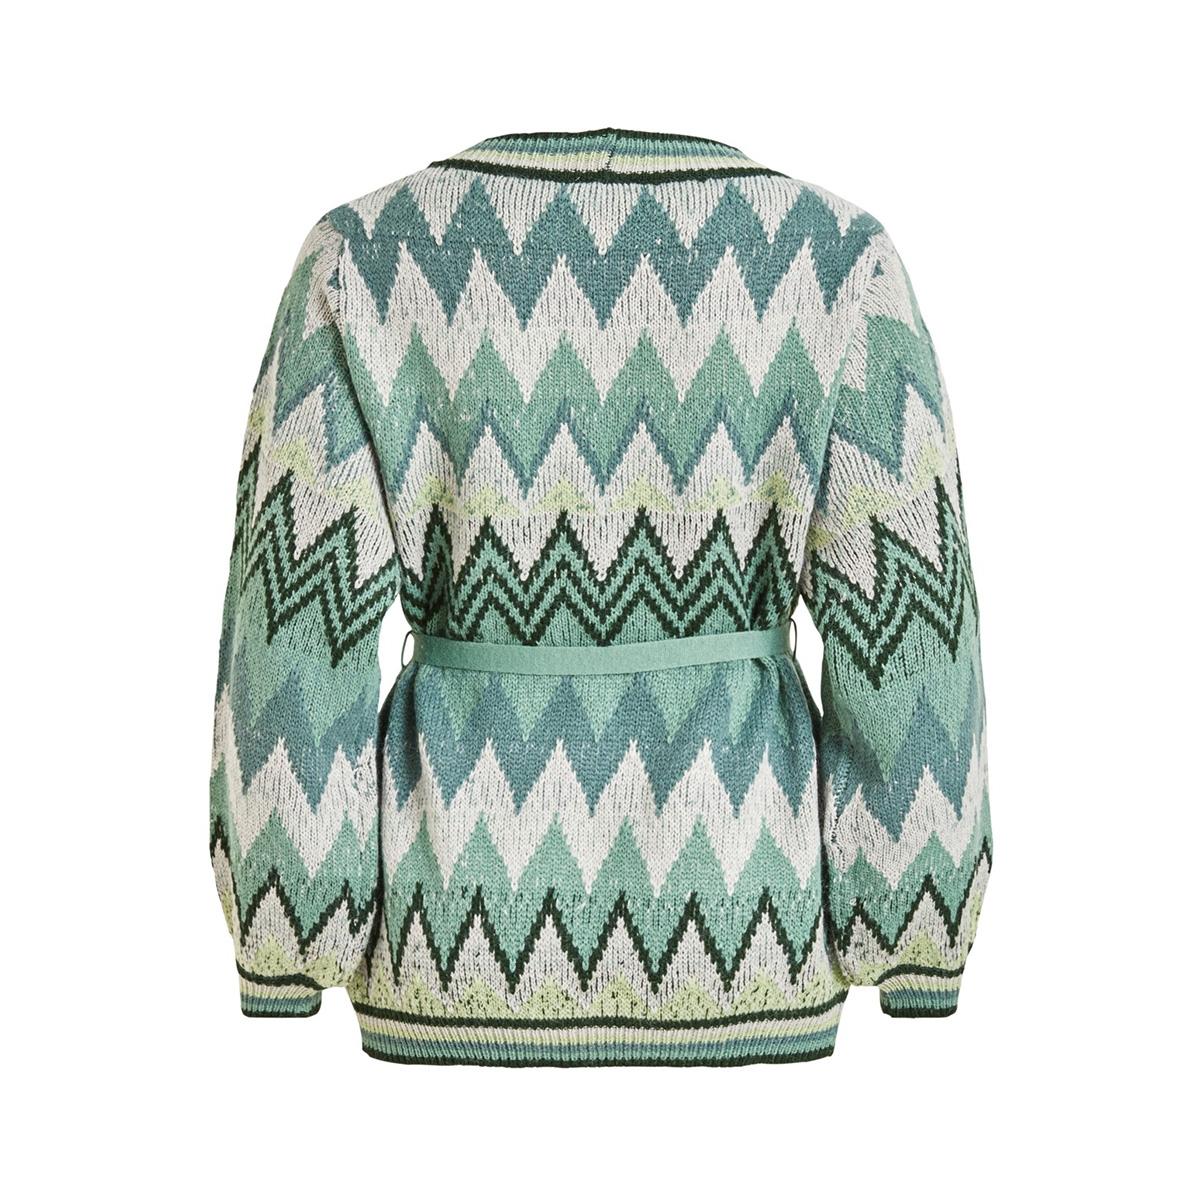 vifrey knit l/s cardigan 14053637 vila vest pine grove/oil blue + s